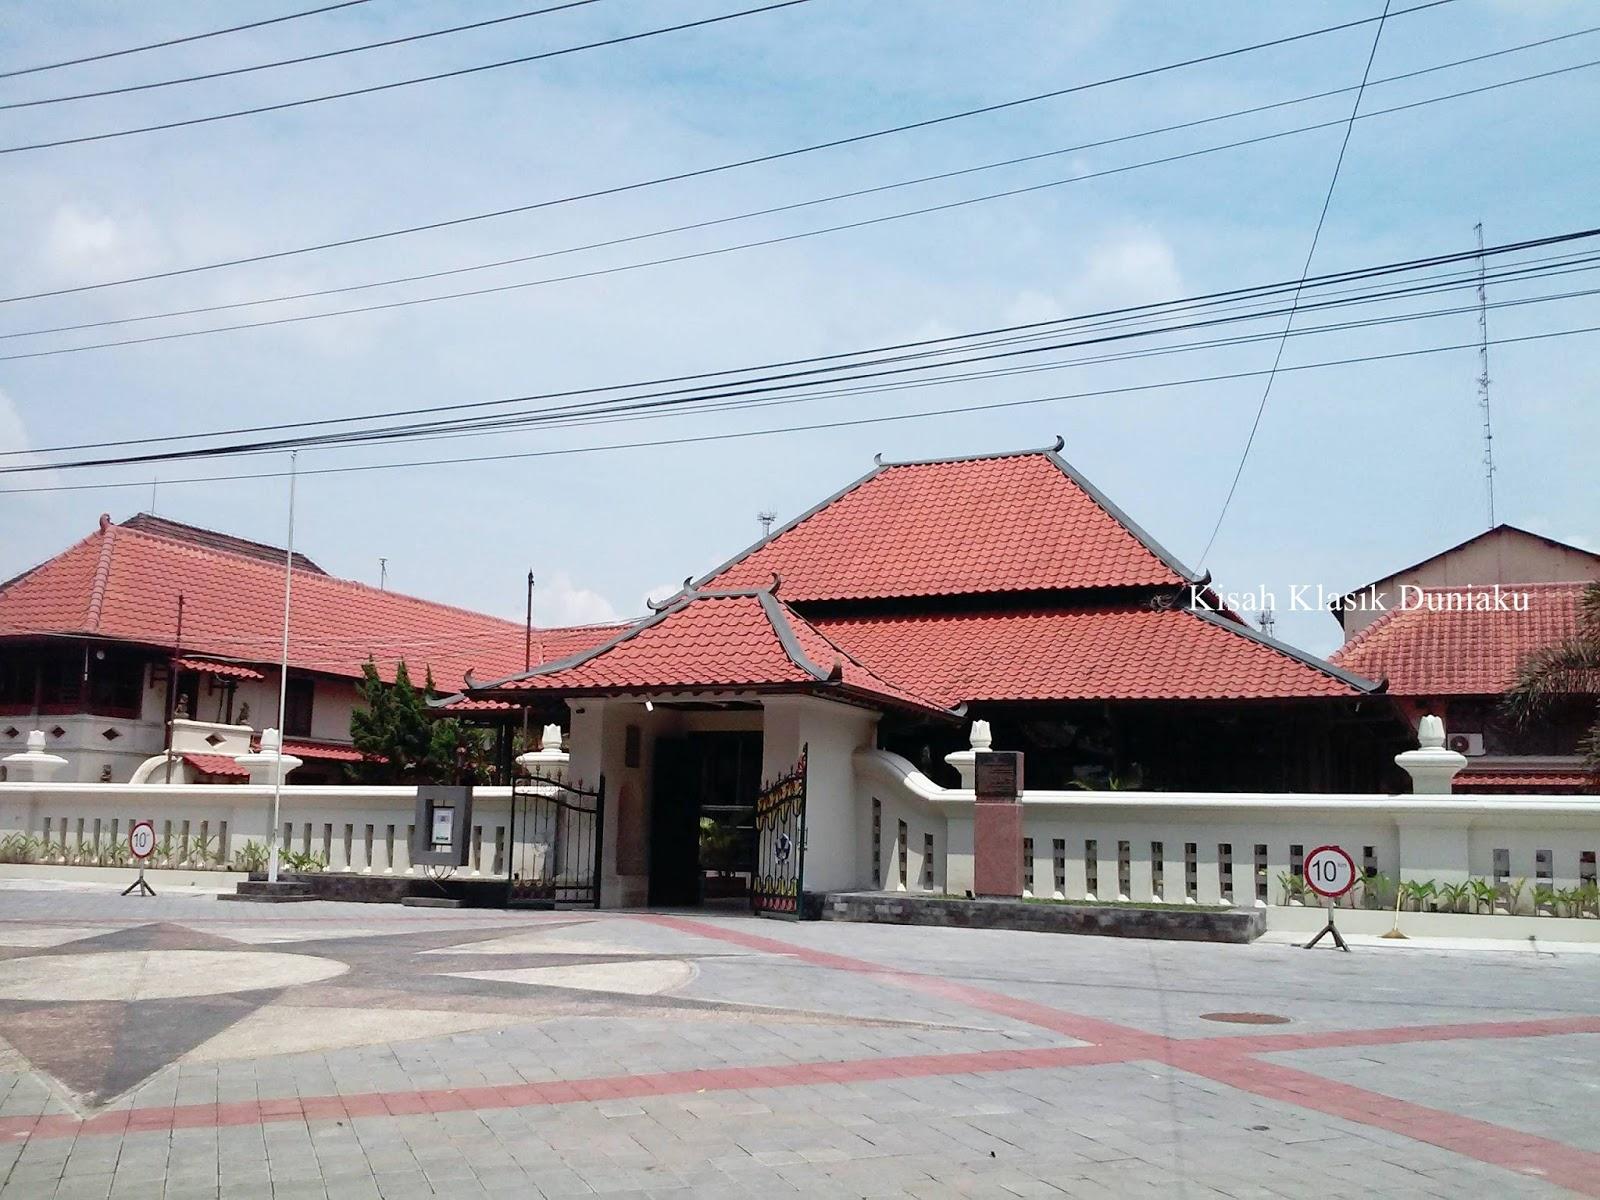 Kisah Klasik Duniaku Museum Sonobudoyo Unit 1 Galeri Kota Yogyakarta